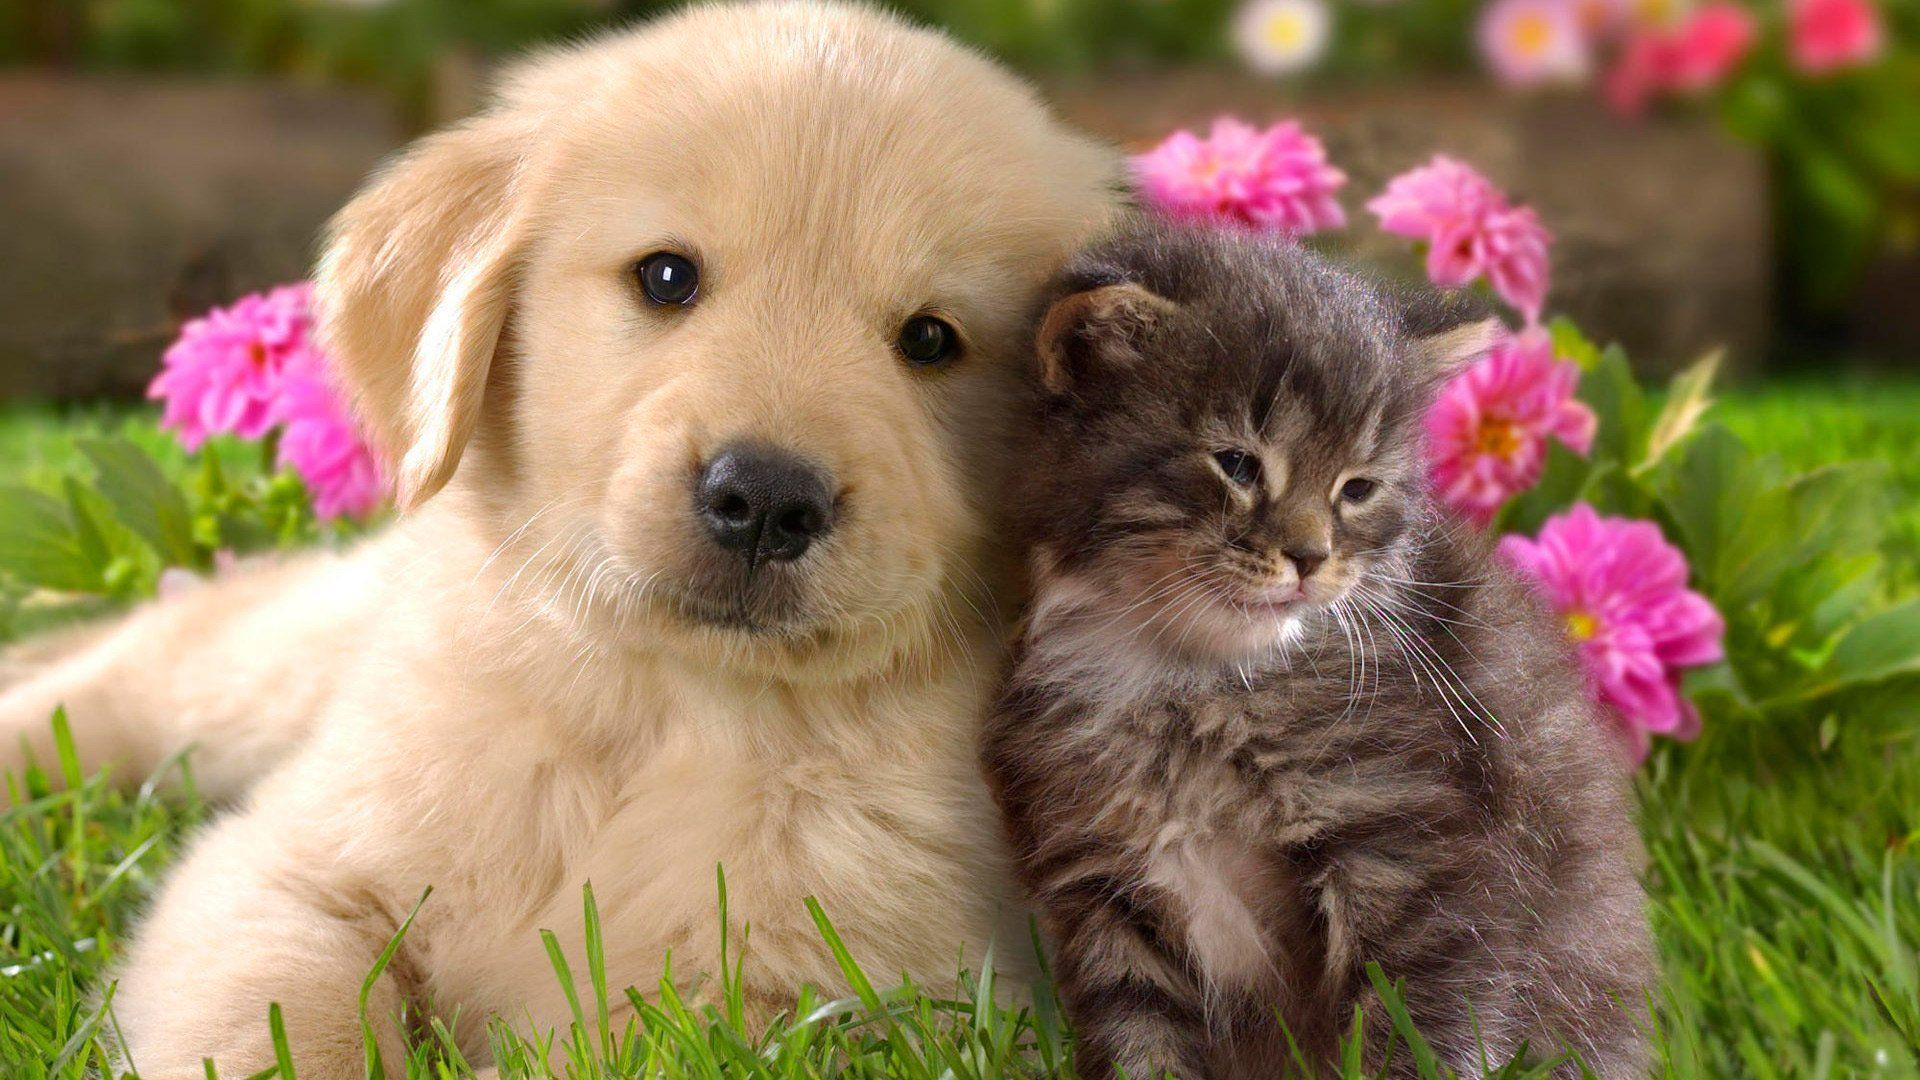 Puppy And Kitten PC Wallpaper HD